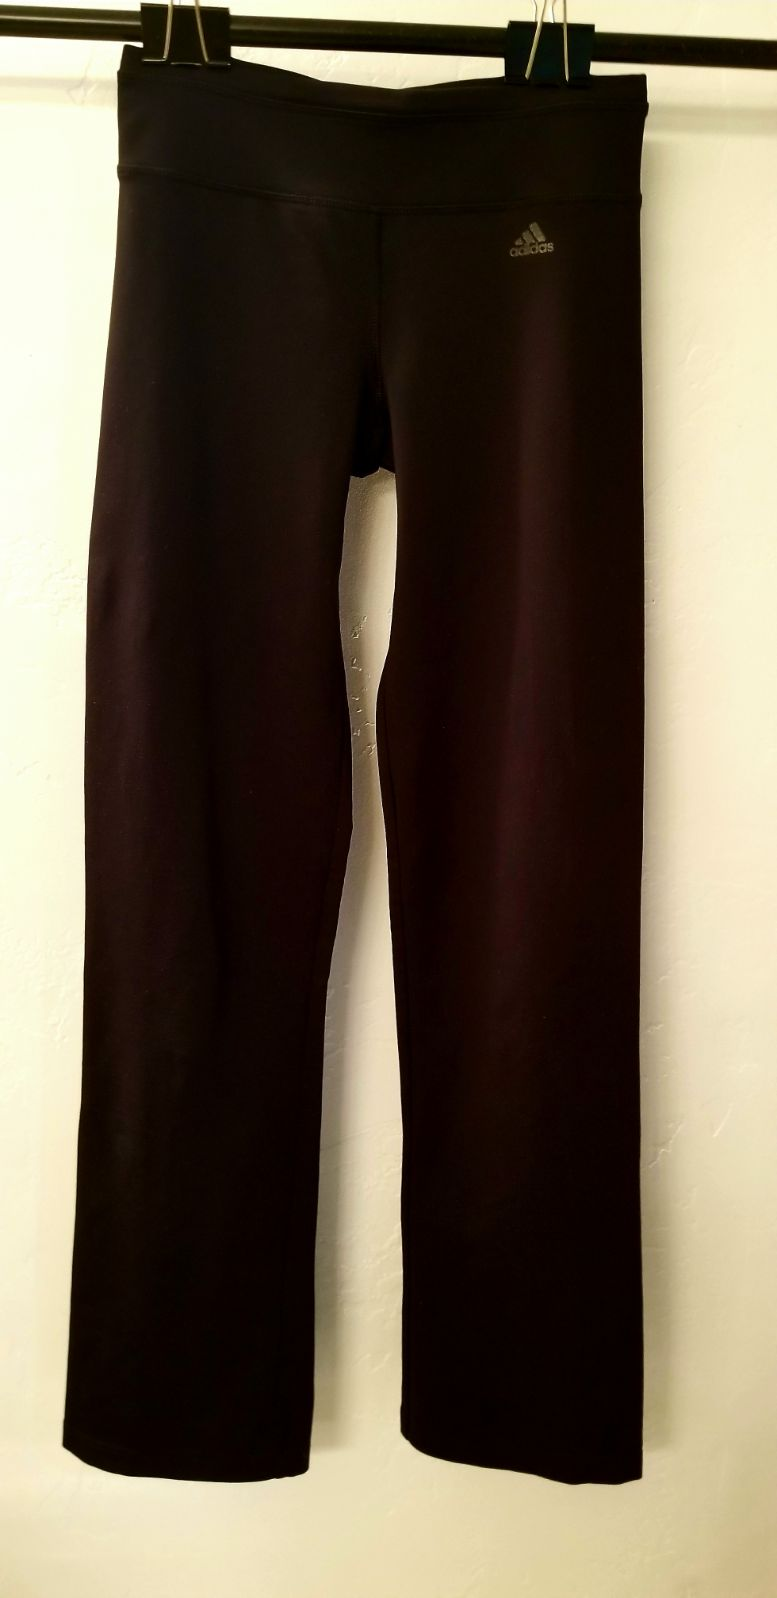 Adidas Black Yoga Pants XS